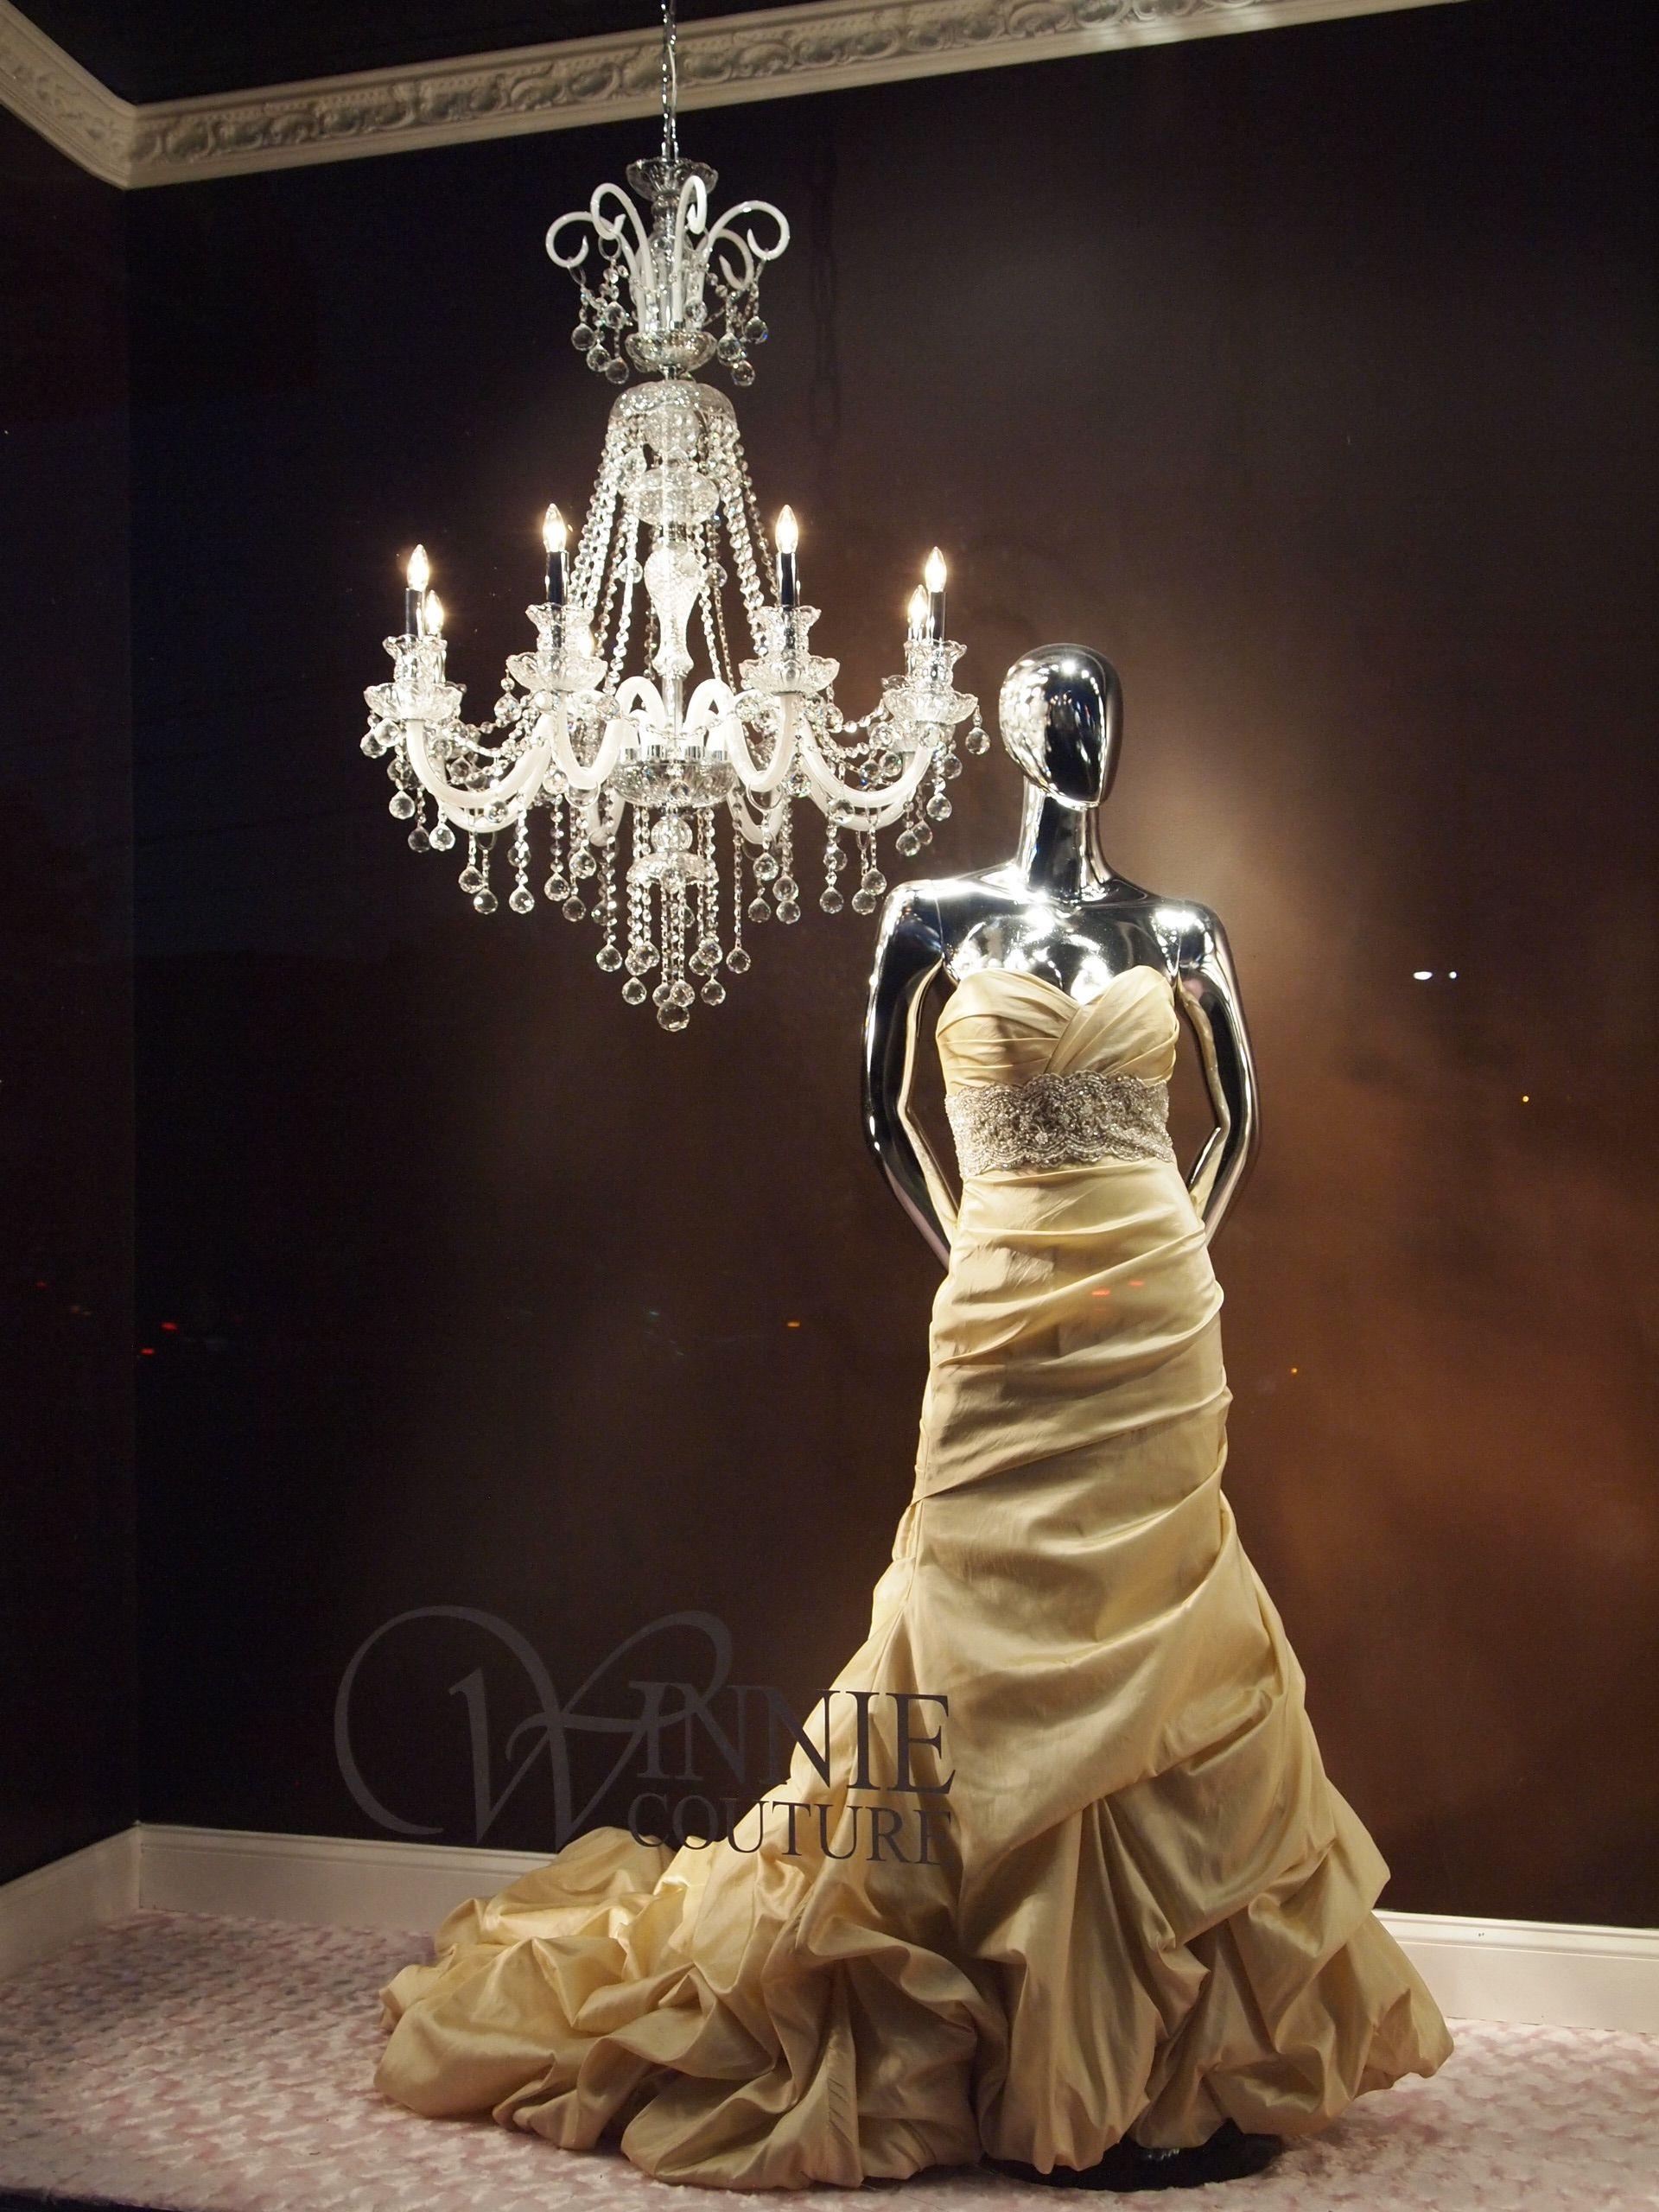 Winnie couture flagship bridal salon atlanta wedding gown display